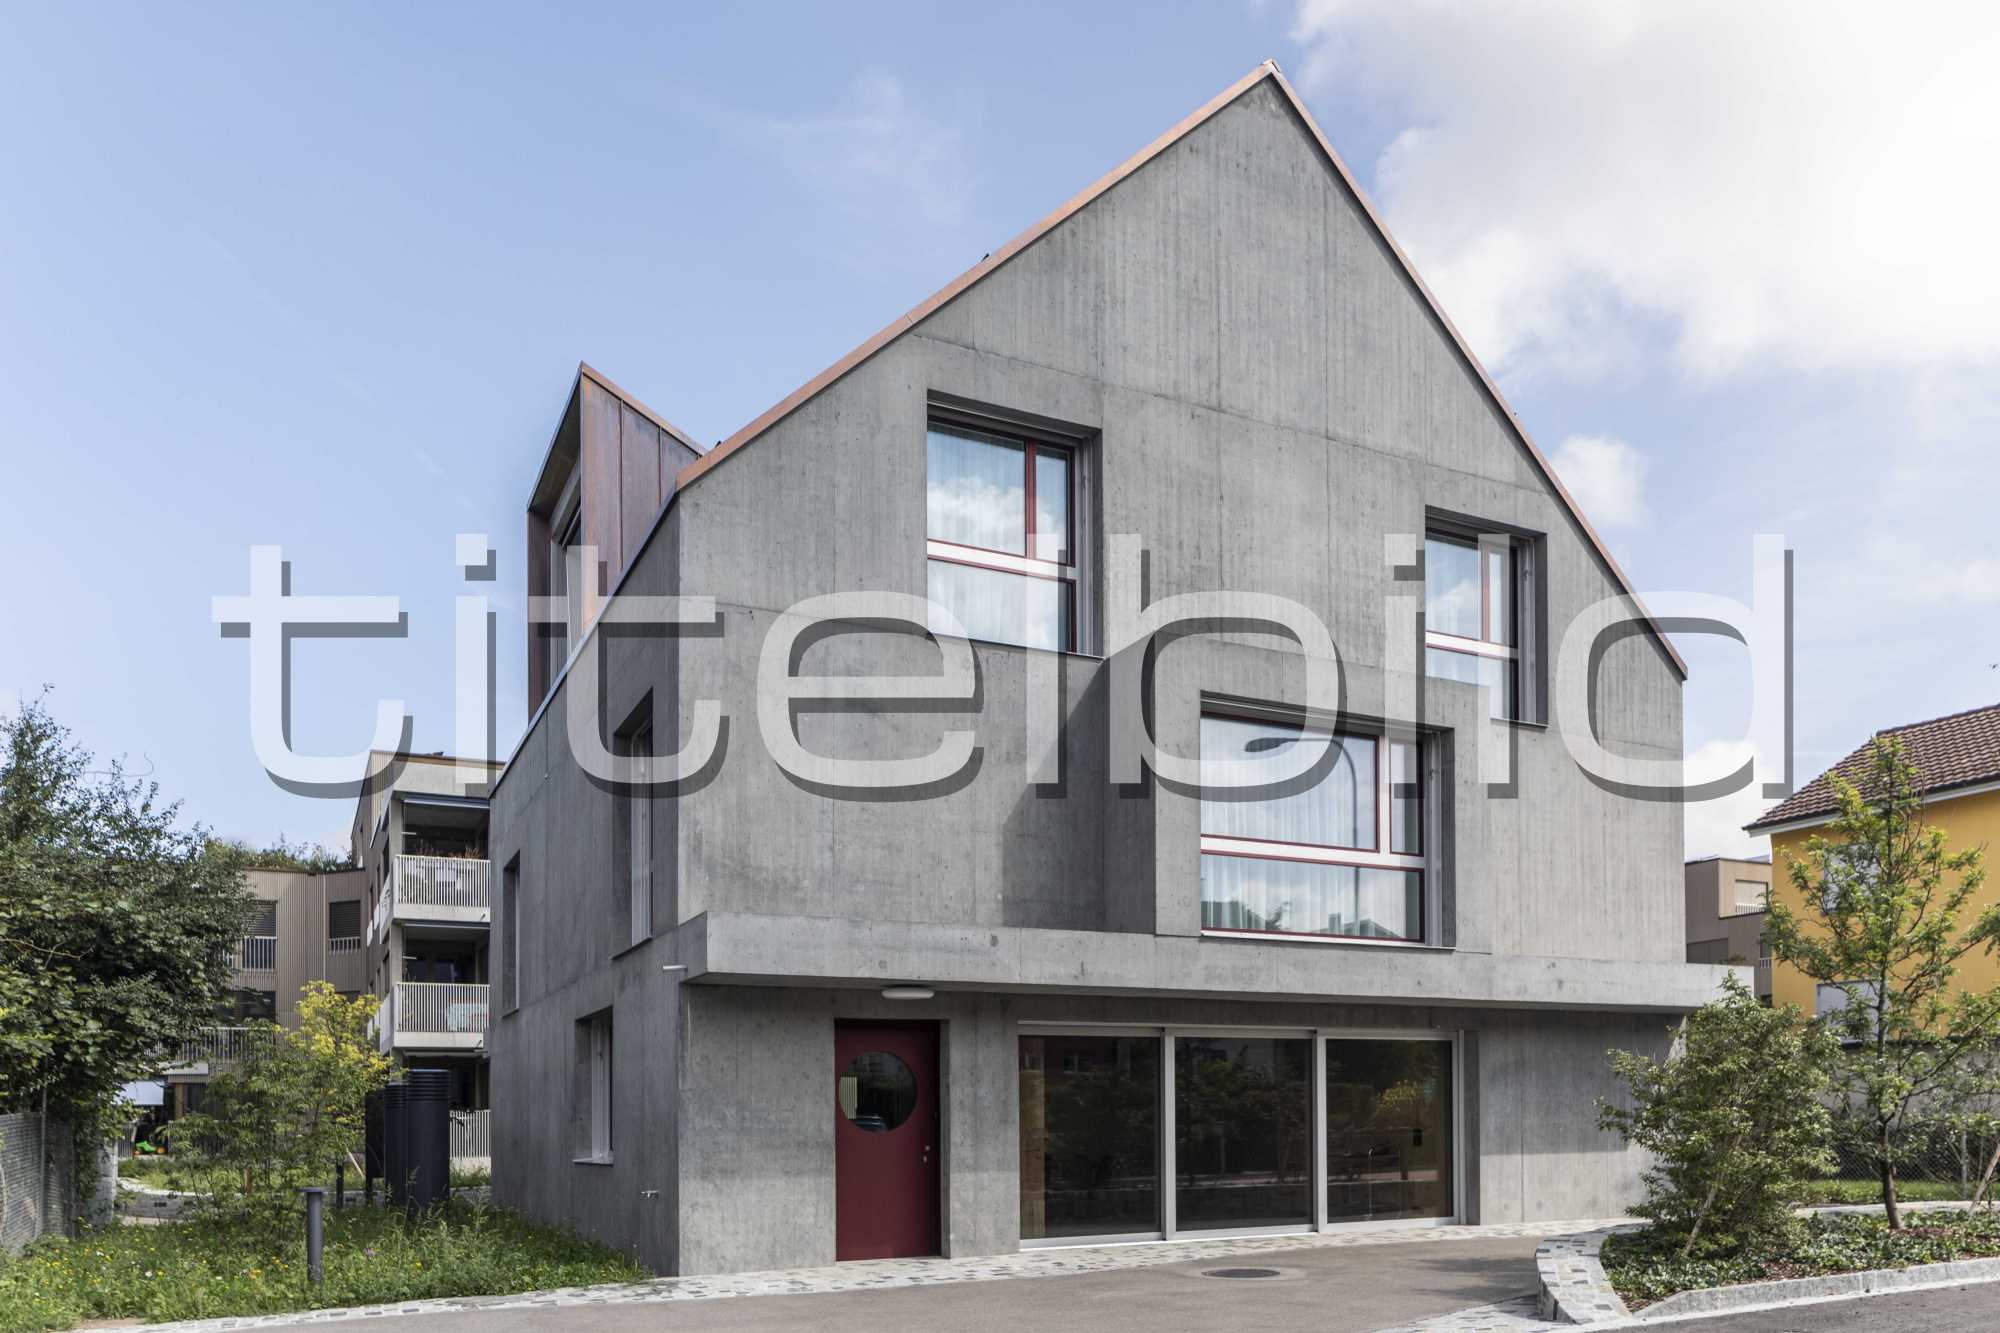 Projektbild-Nr. 2: Neubau Siedlung Riedgraben (Siedlungslokal)